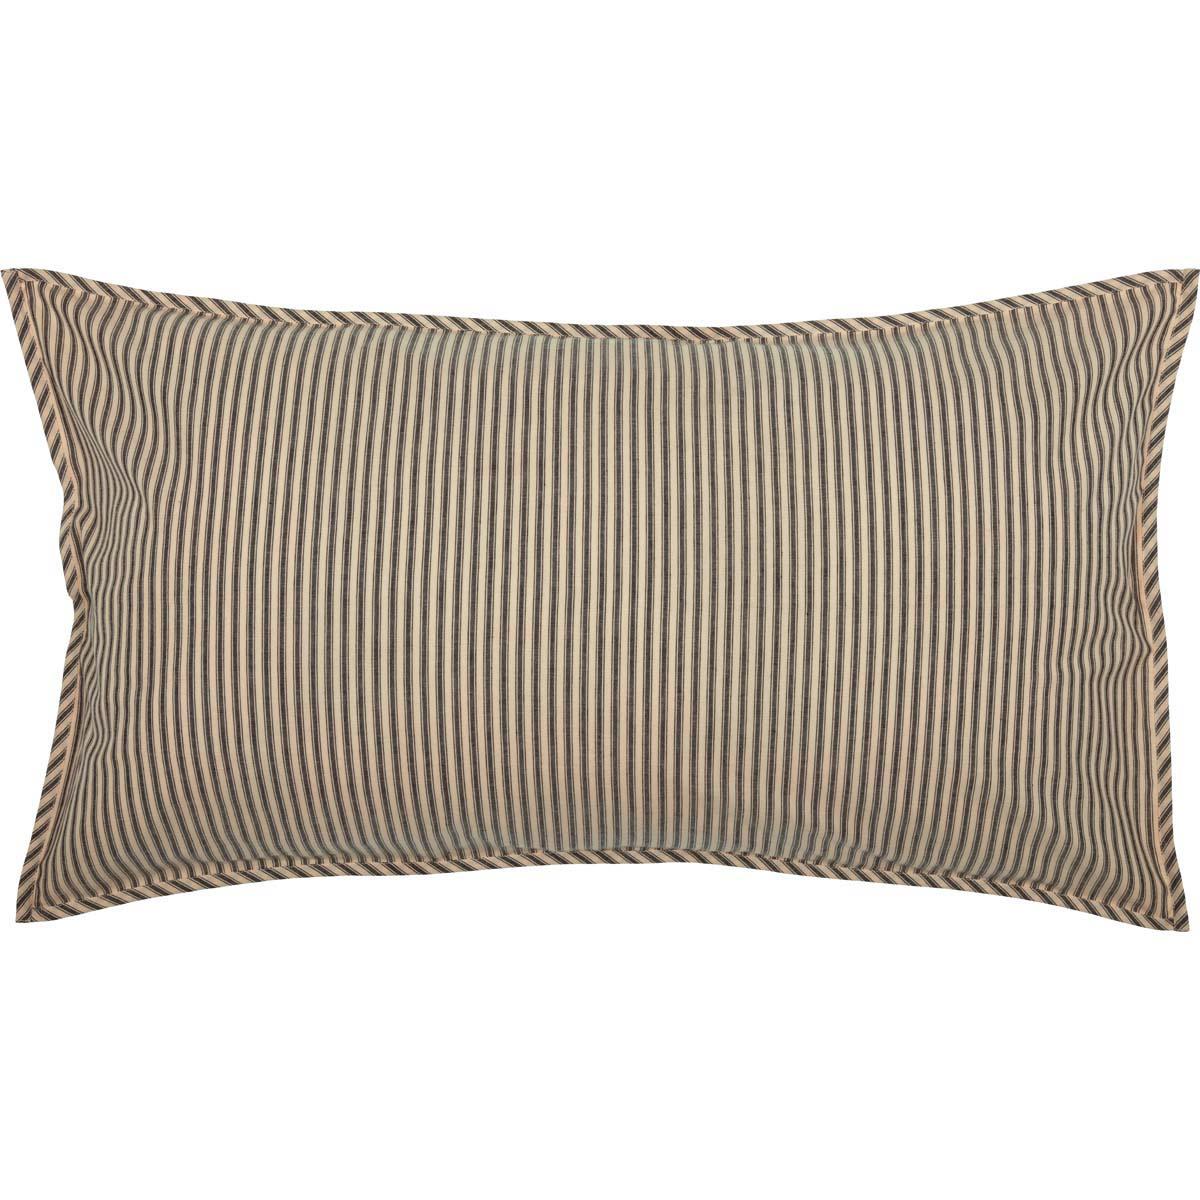 Sawyer Mill Charcoal Ticking Stripe King Sham 21x37